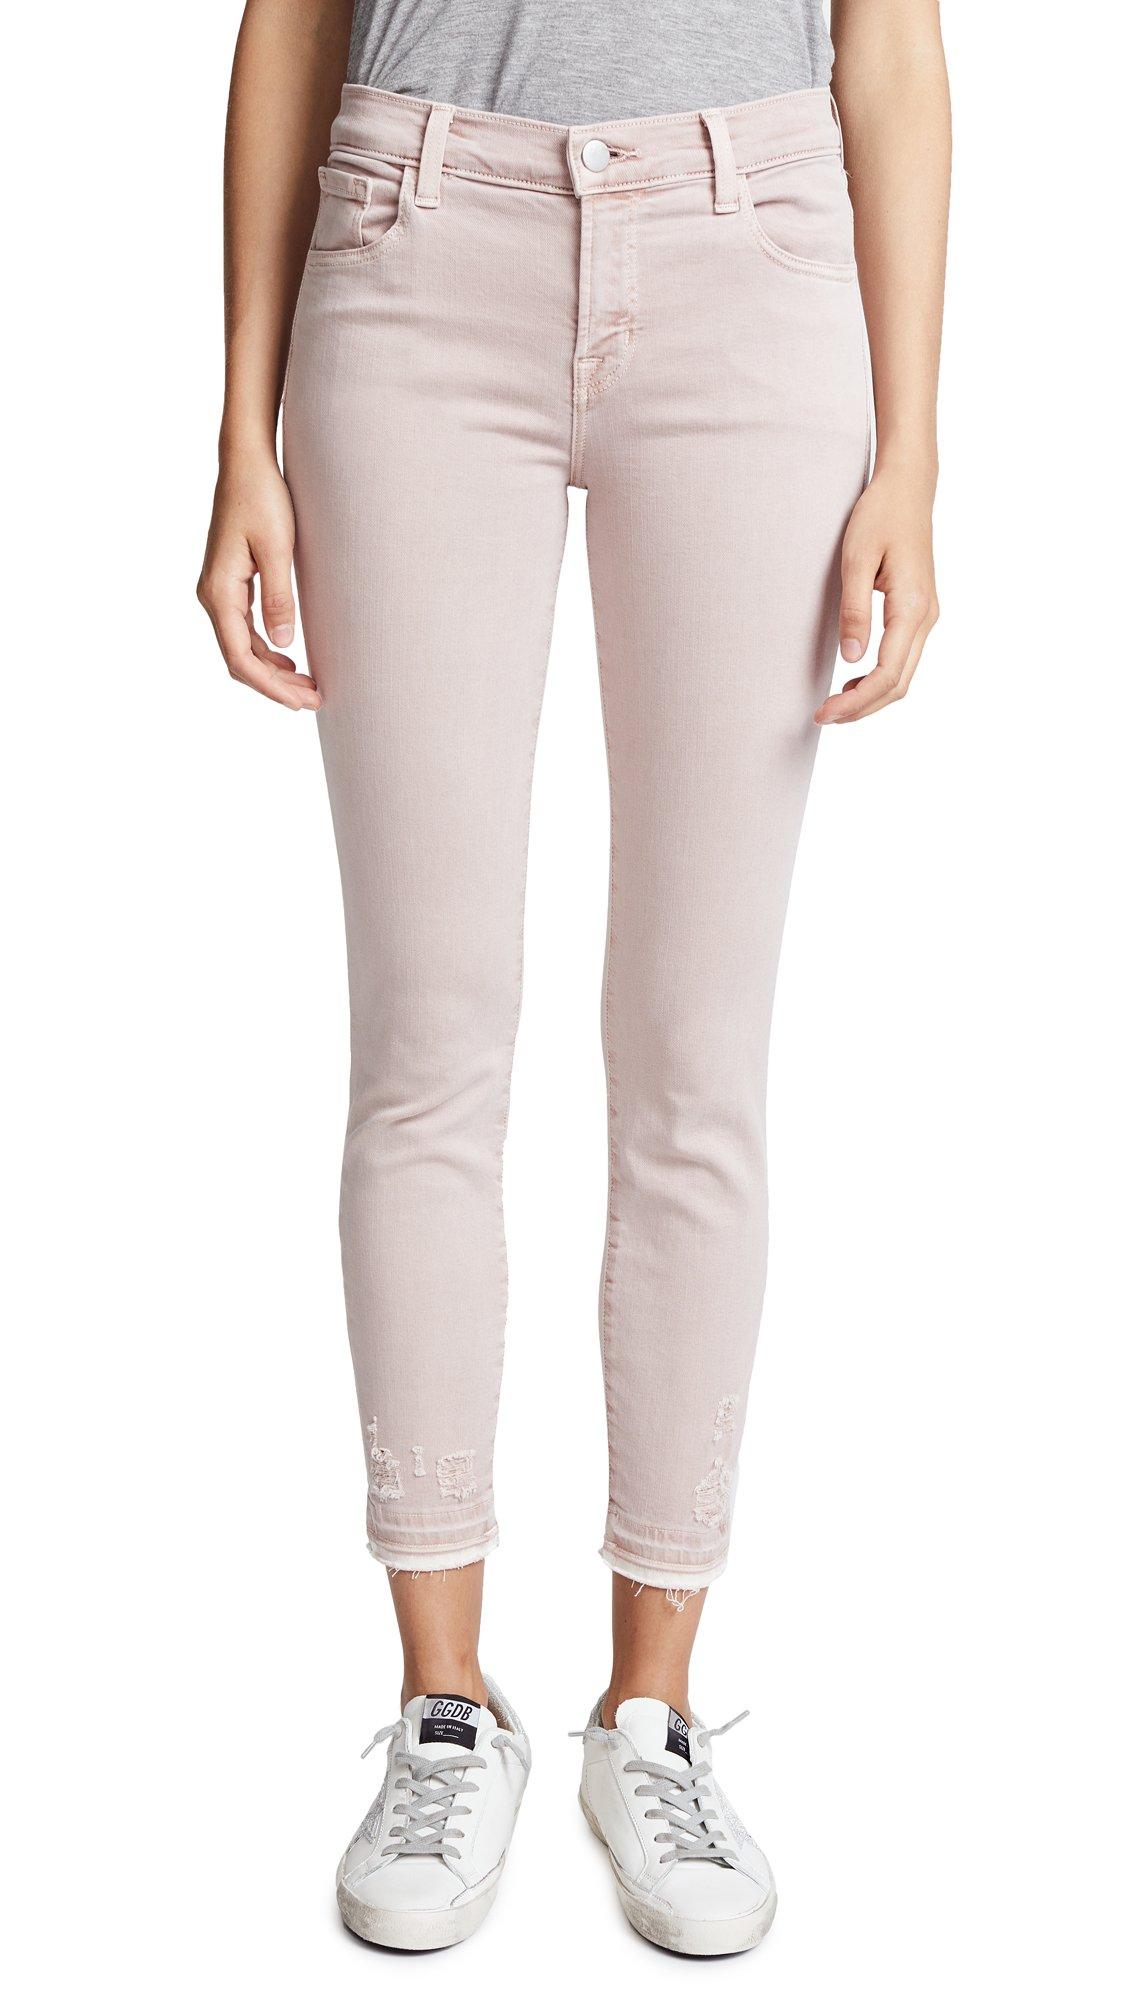 J Brand Women's 835 Mid Rise Crop Skinny Jeans, Vinca Destruct, 26